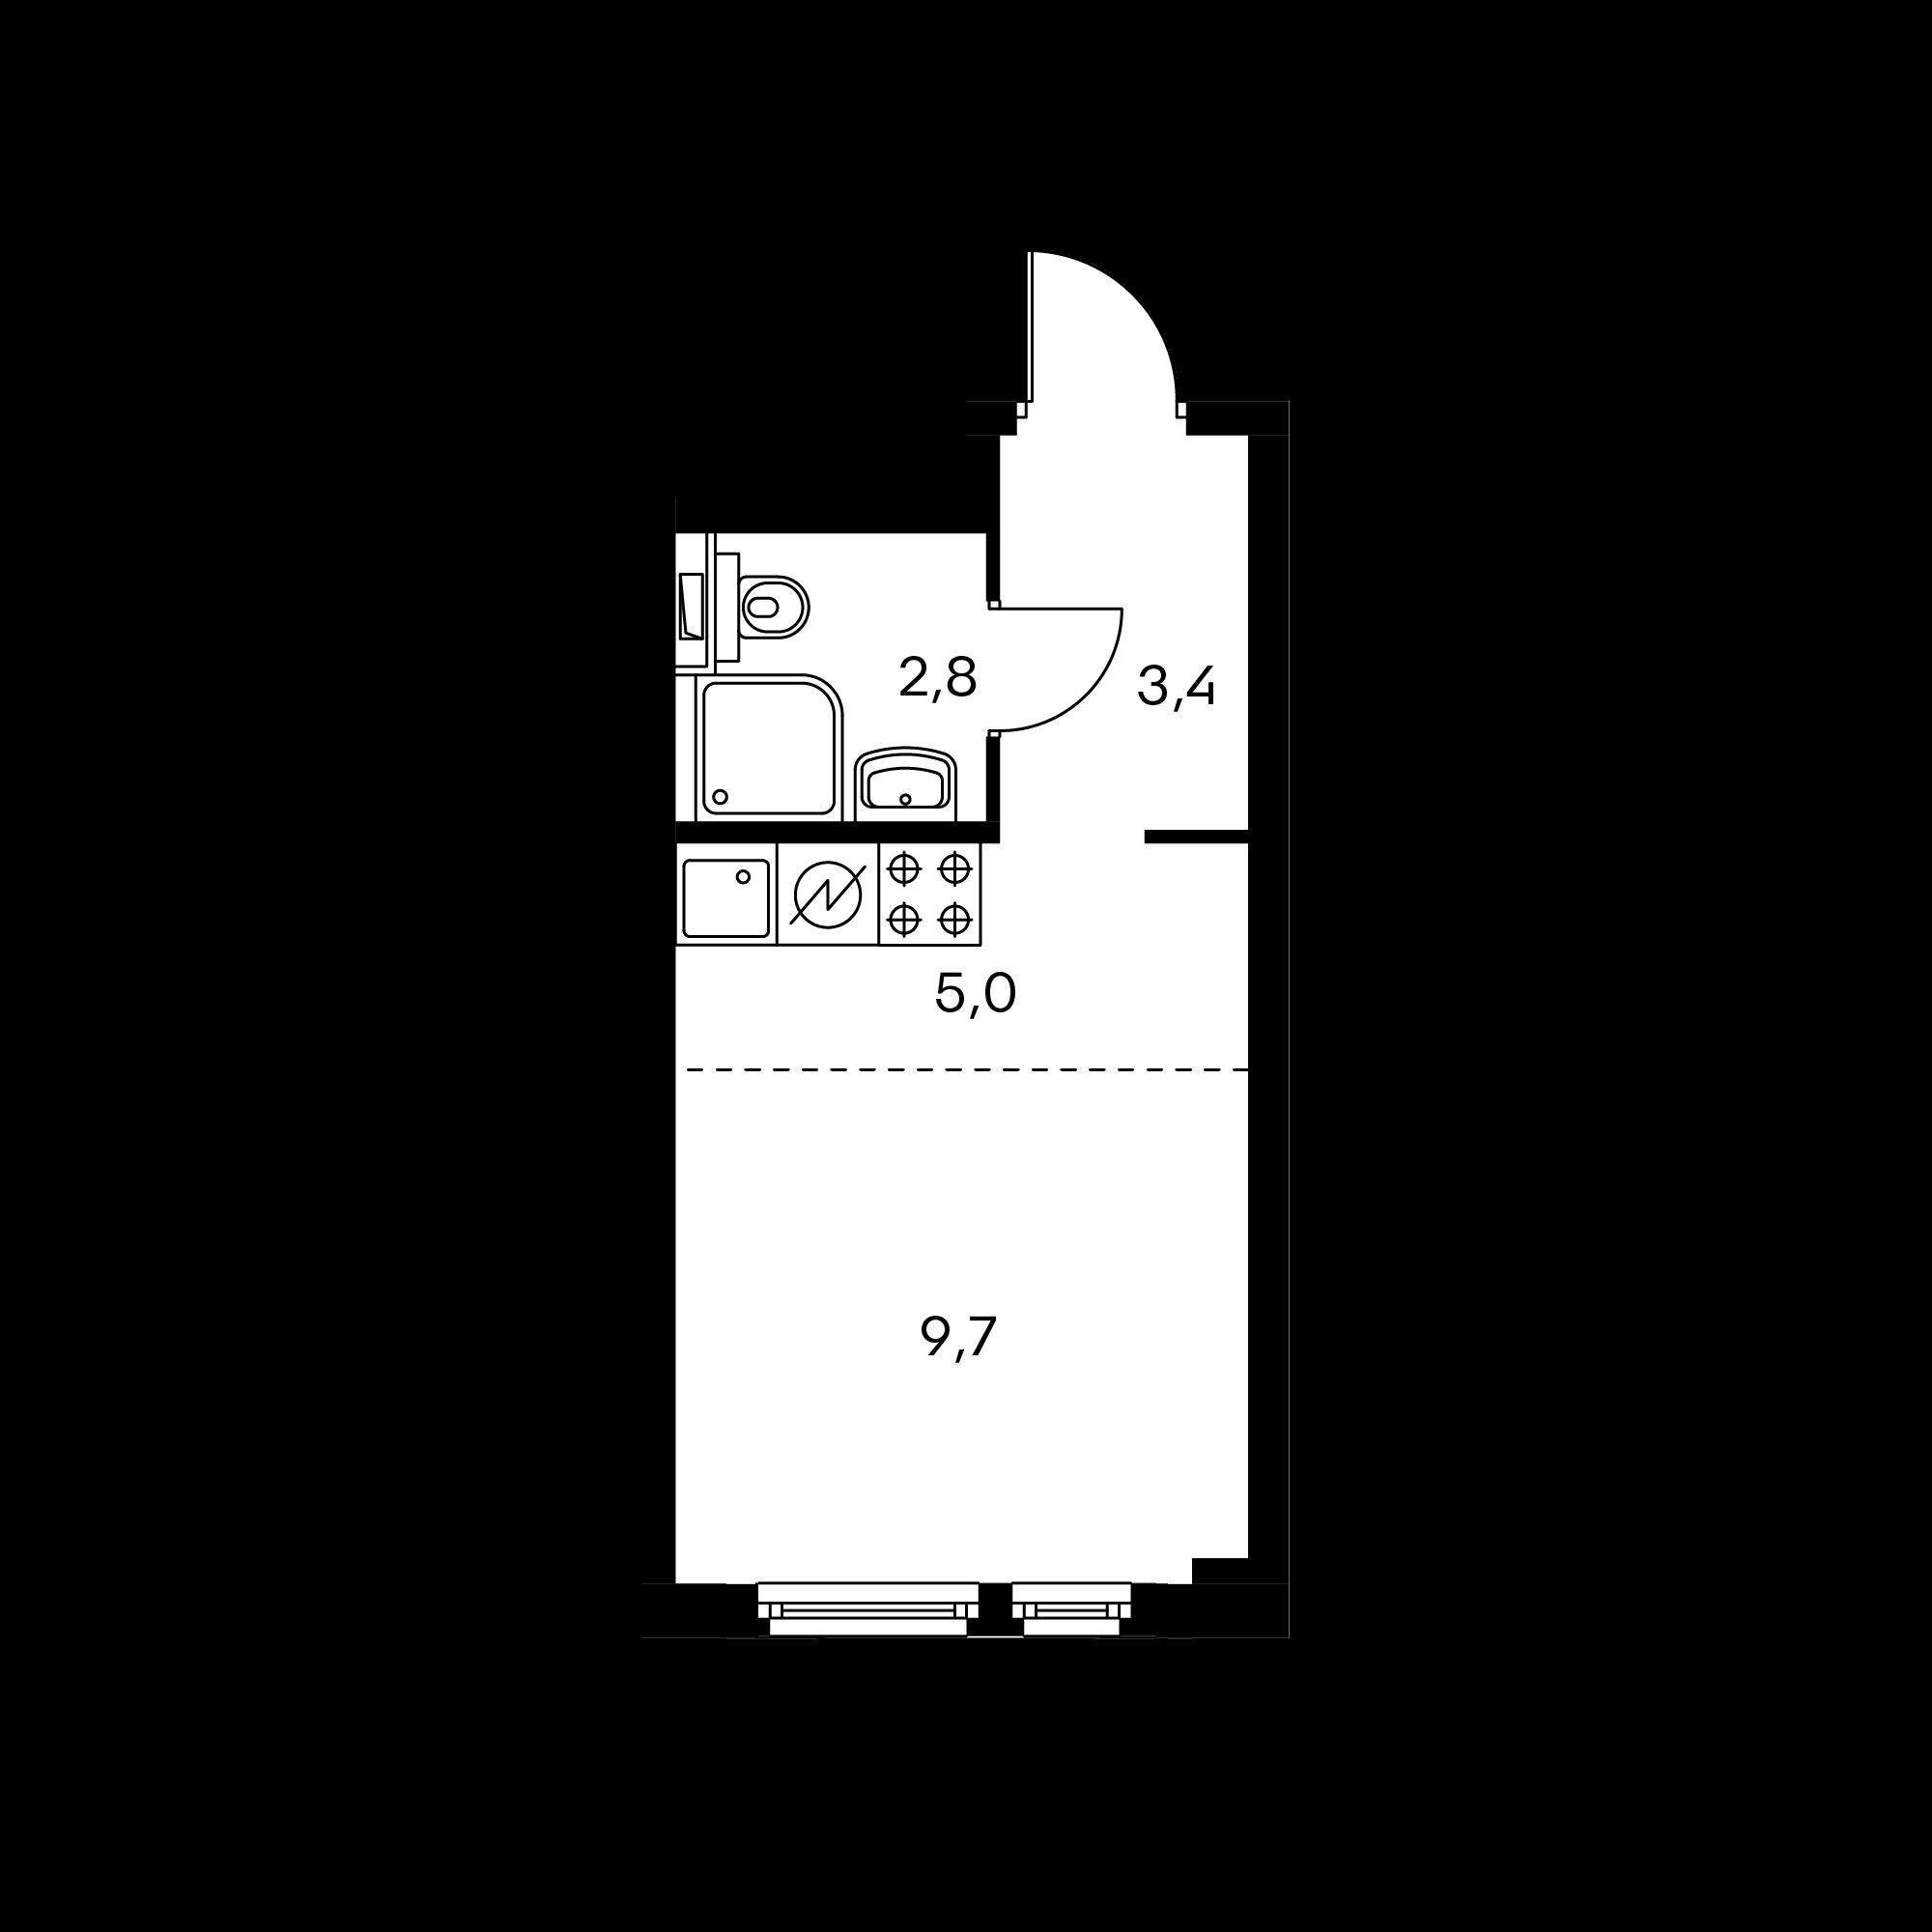 1NS1_3.6-3